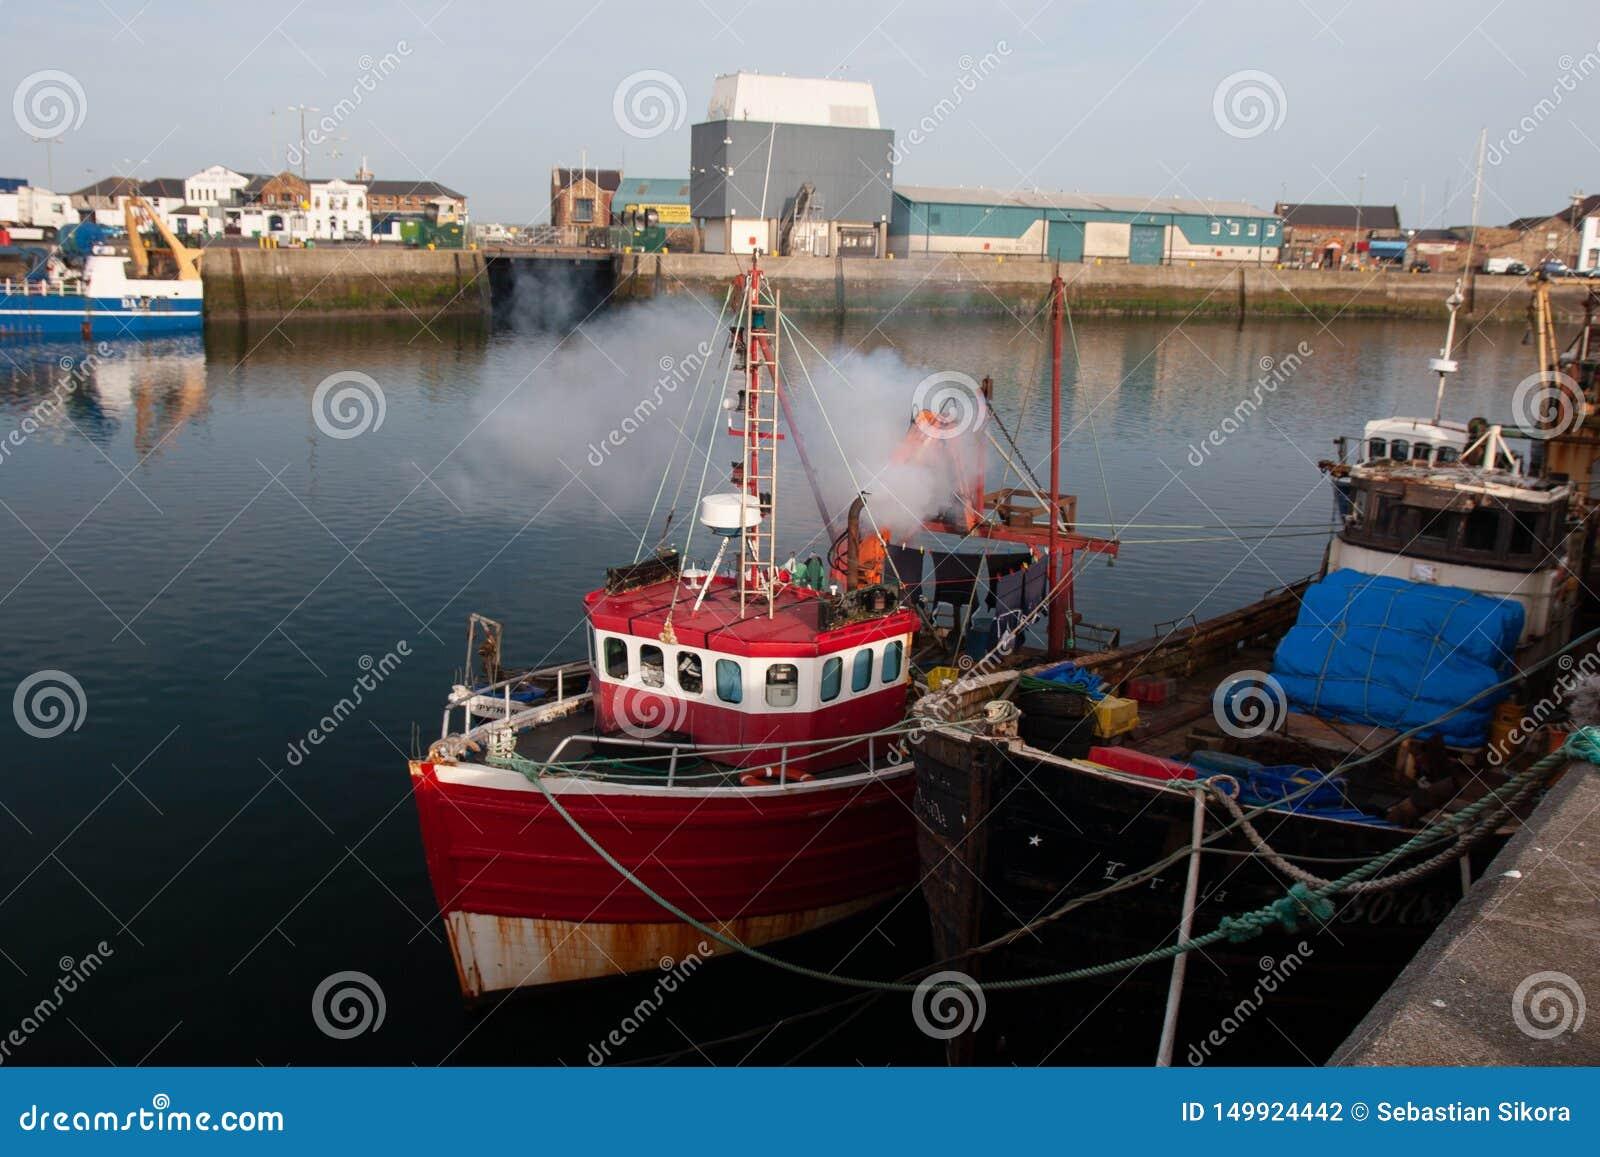 Ierse vissersboten in Haven van Howth, Provincie Leinster Dublin Ireland